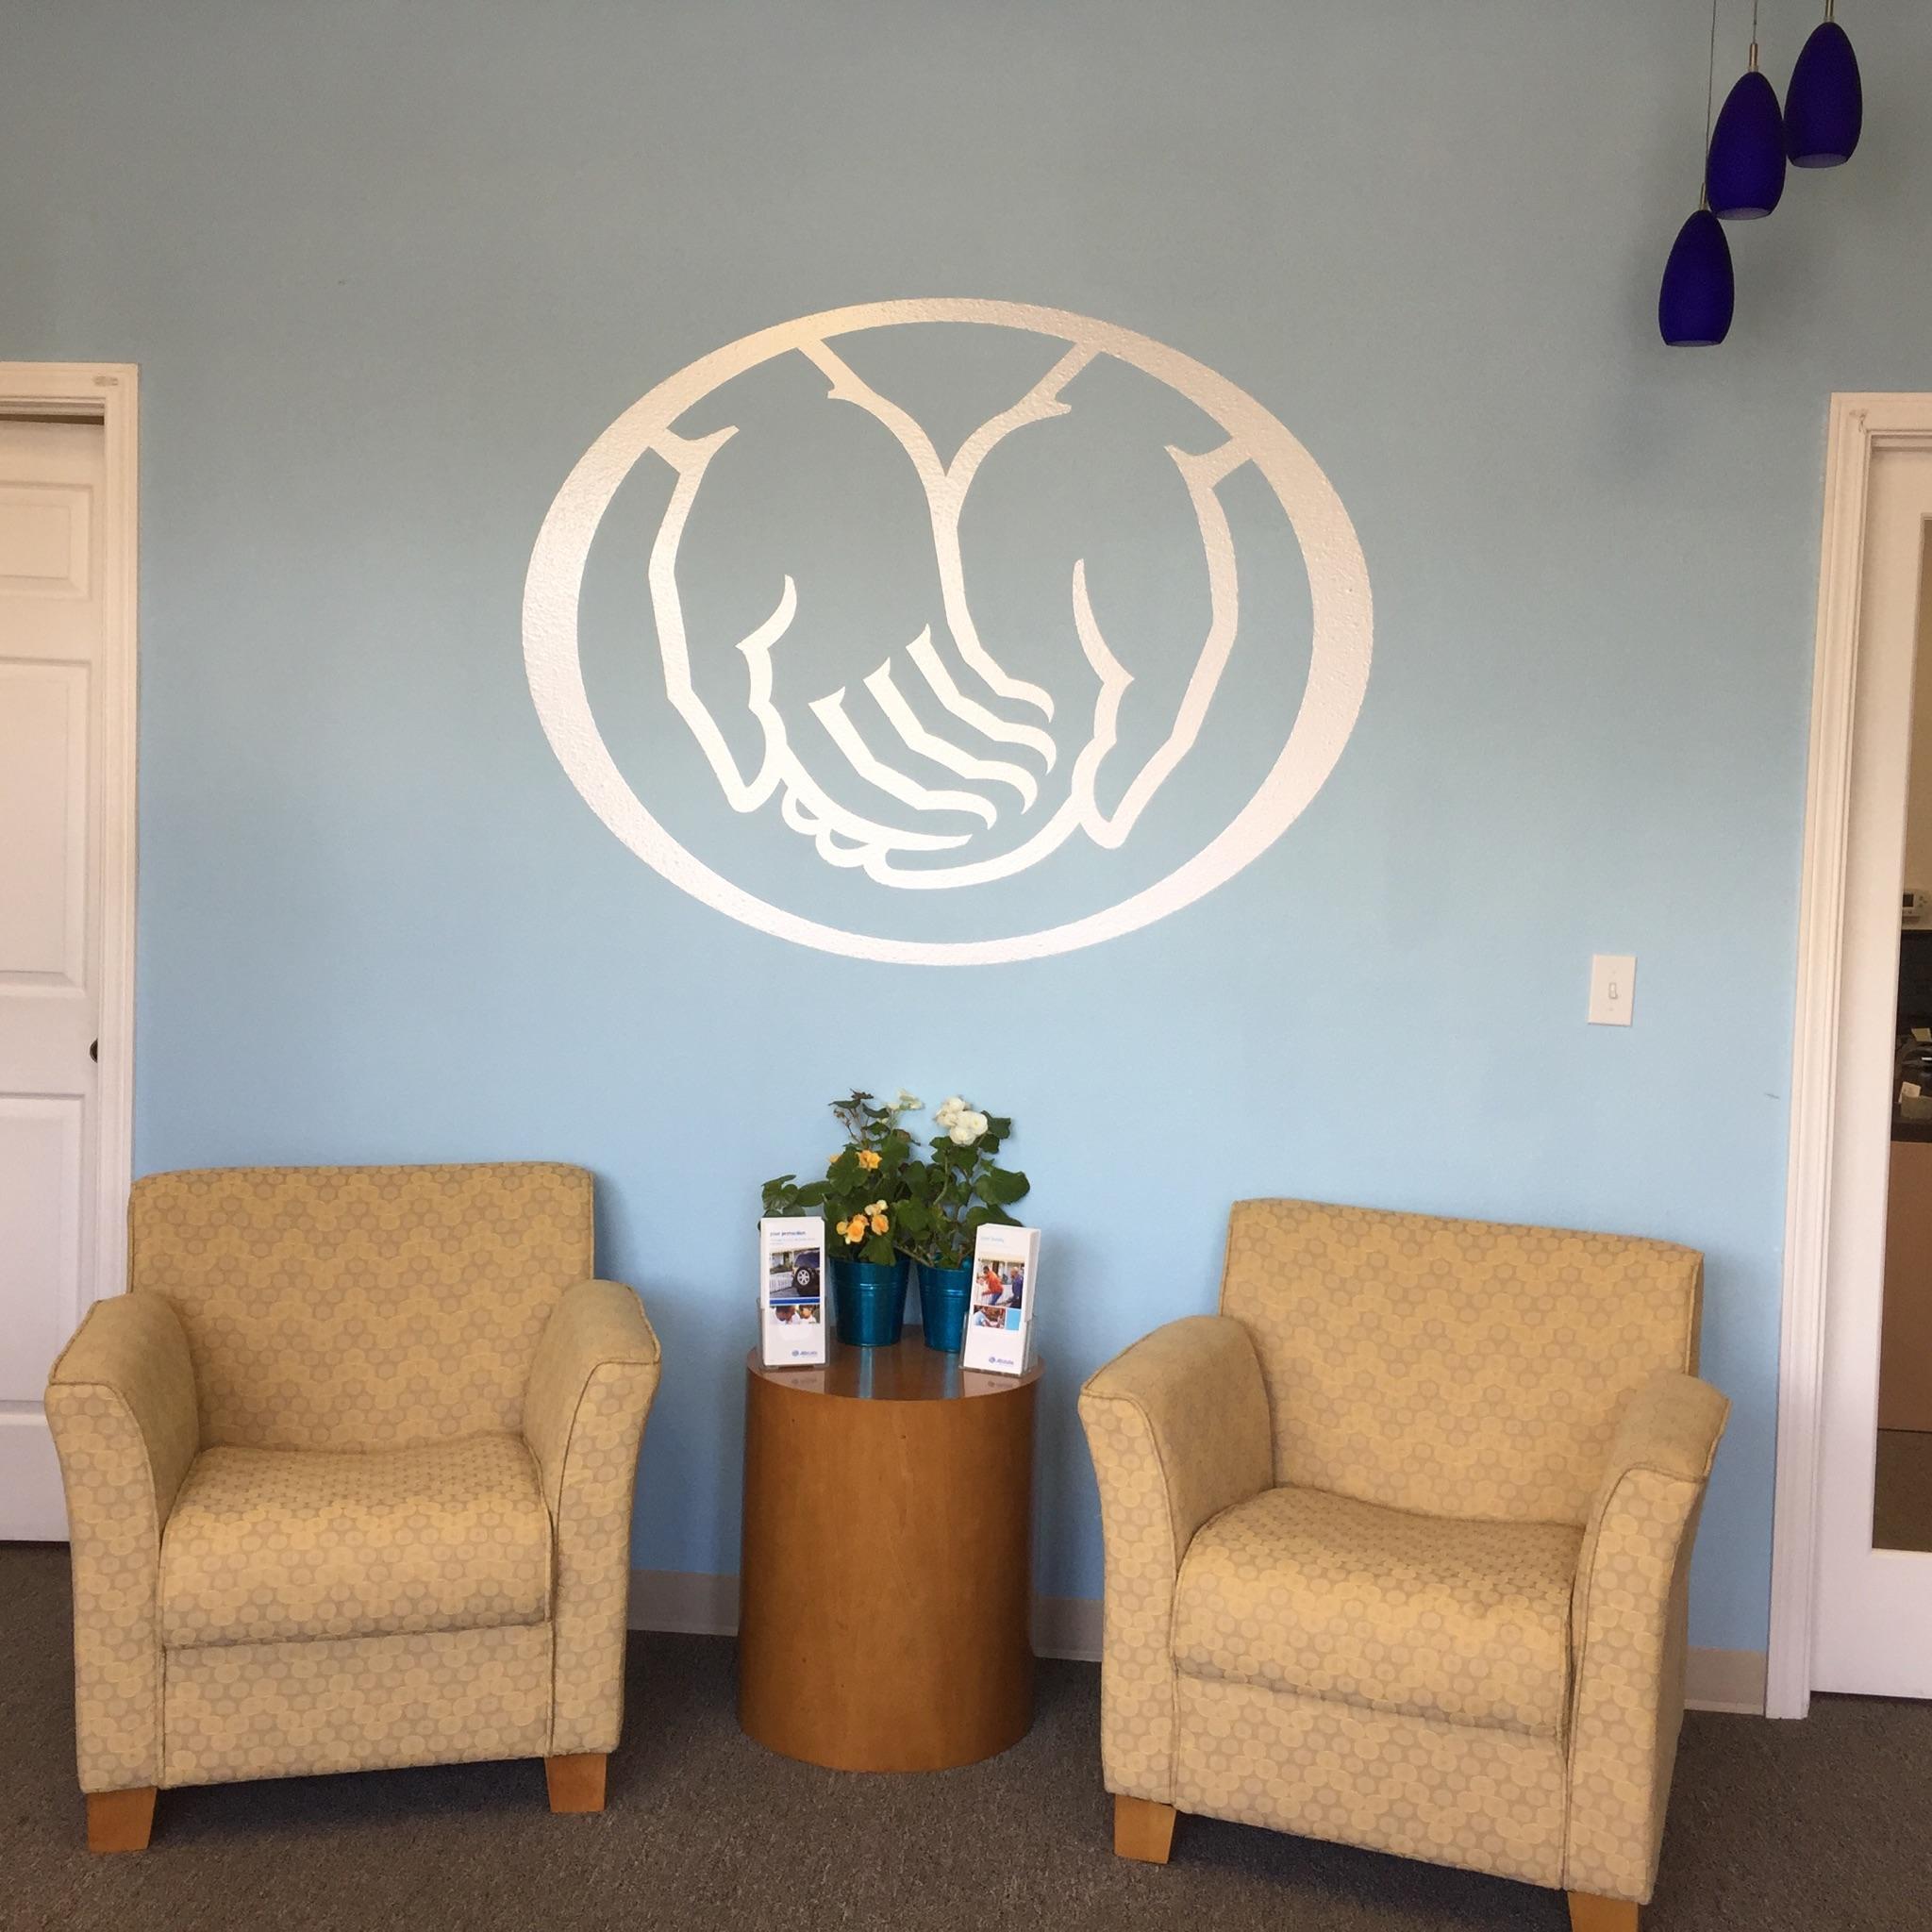 Allstate Insurance Agent: Claire Roshak image 3